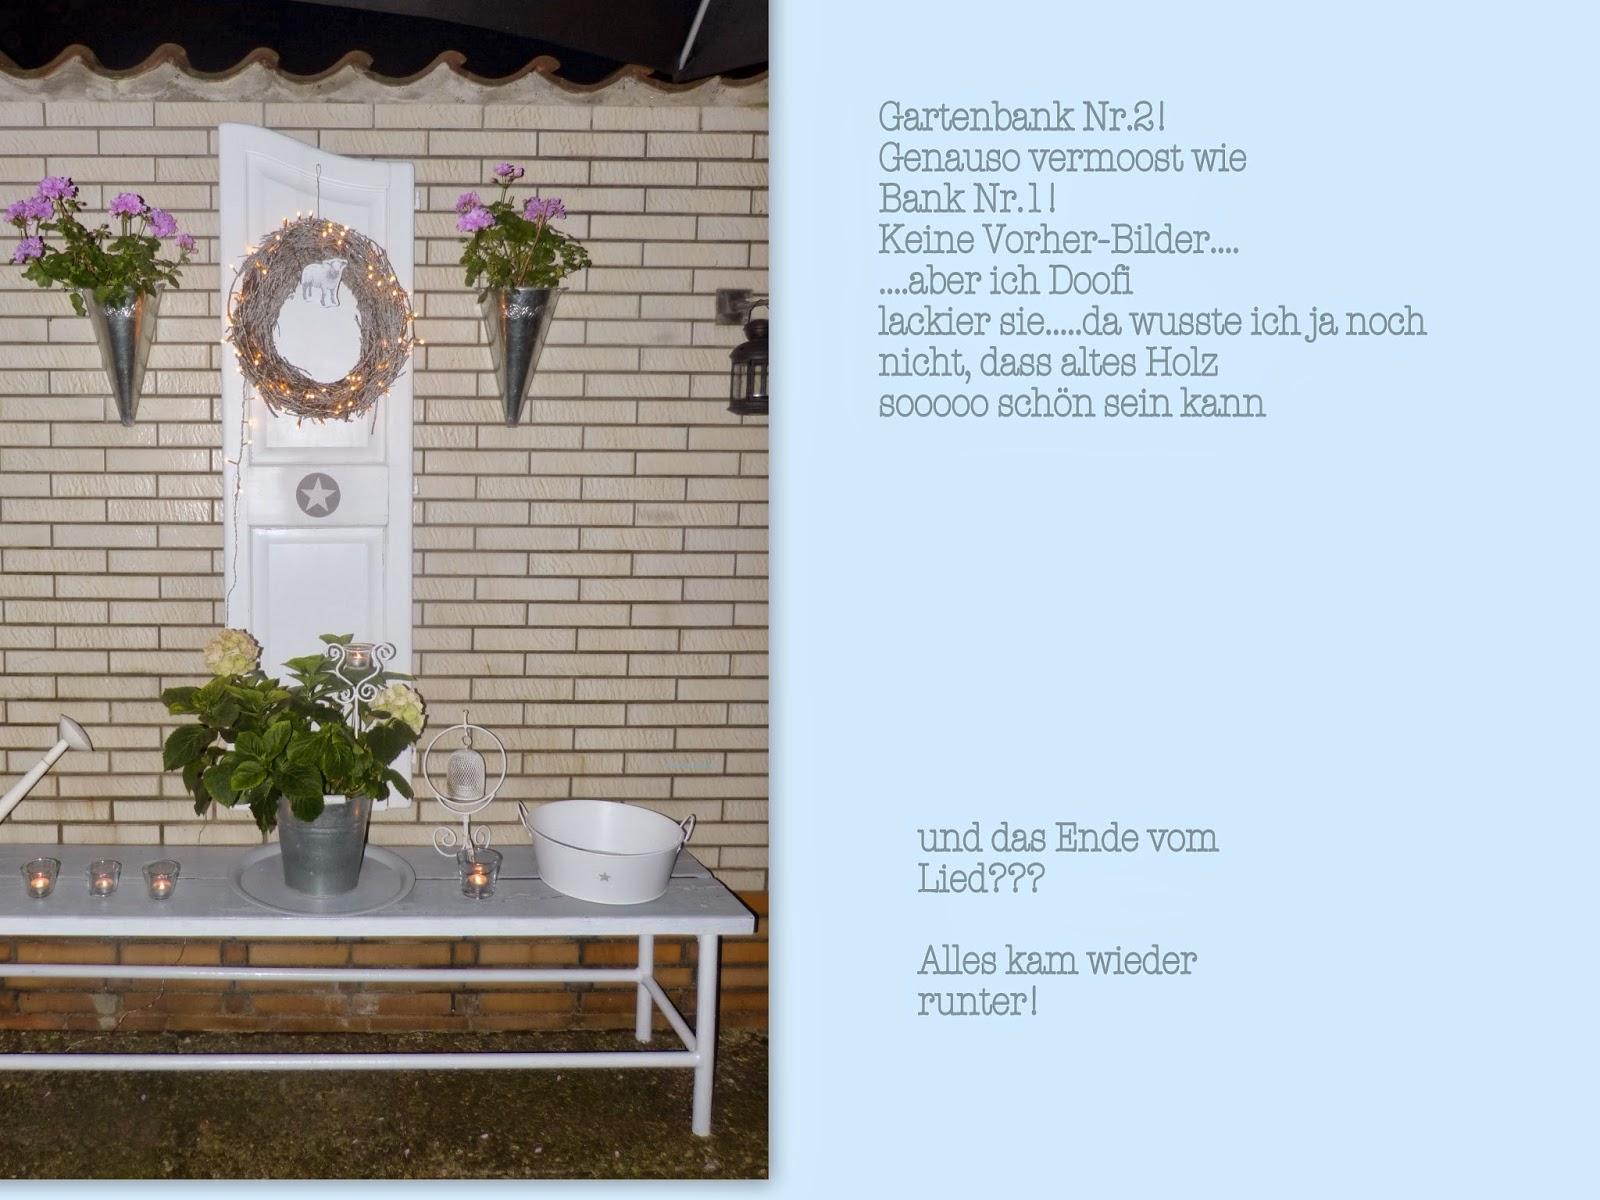 Fantastisch Alte Gartenbänke Fotos - Heimat Ideen ...